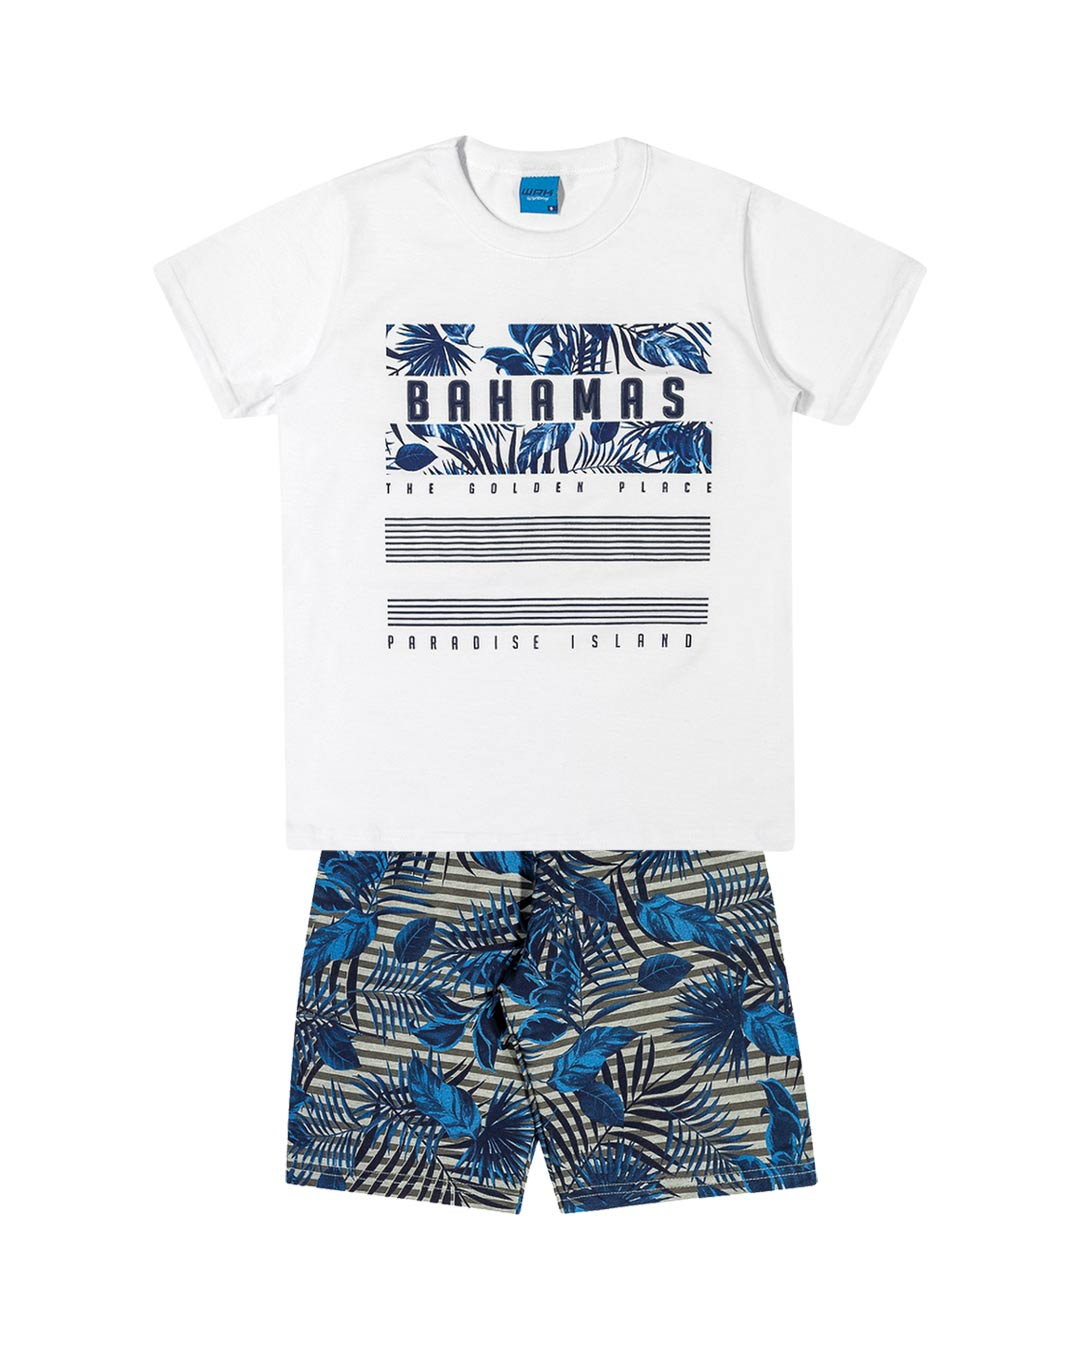 Conjunto Infantil Bahamas - WRK